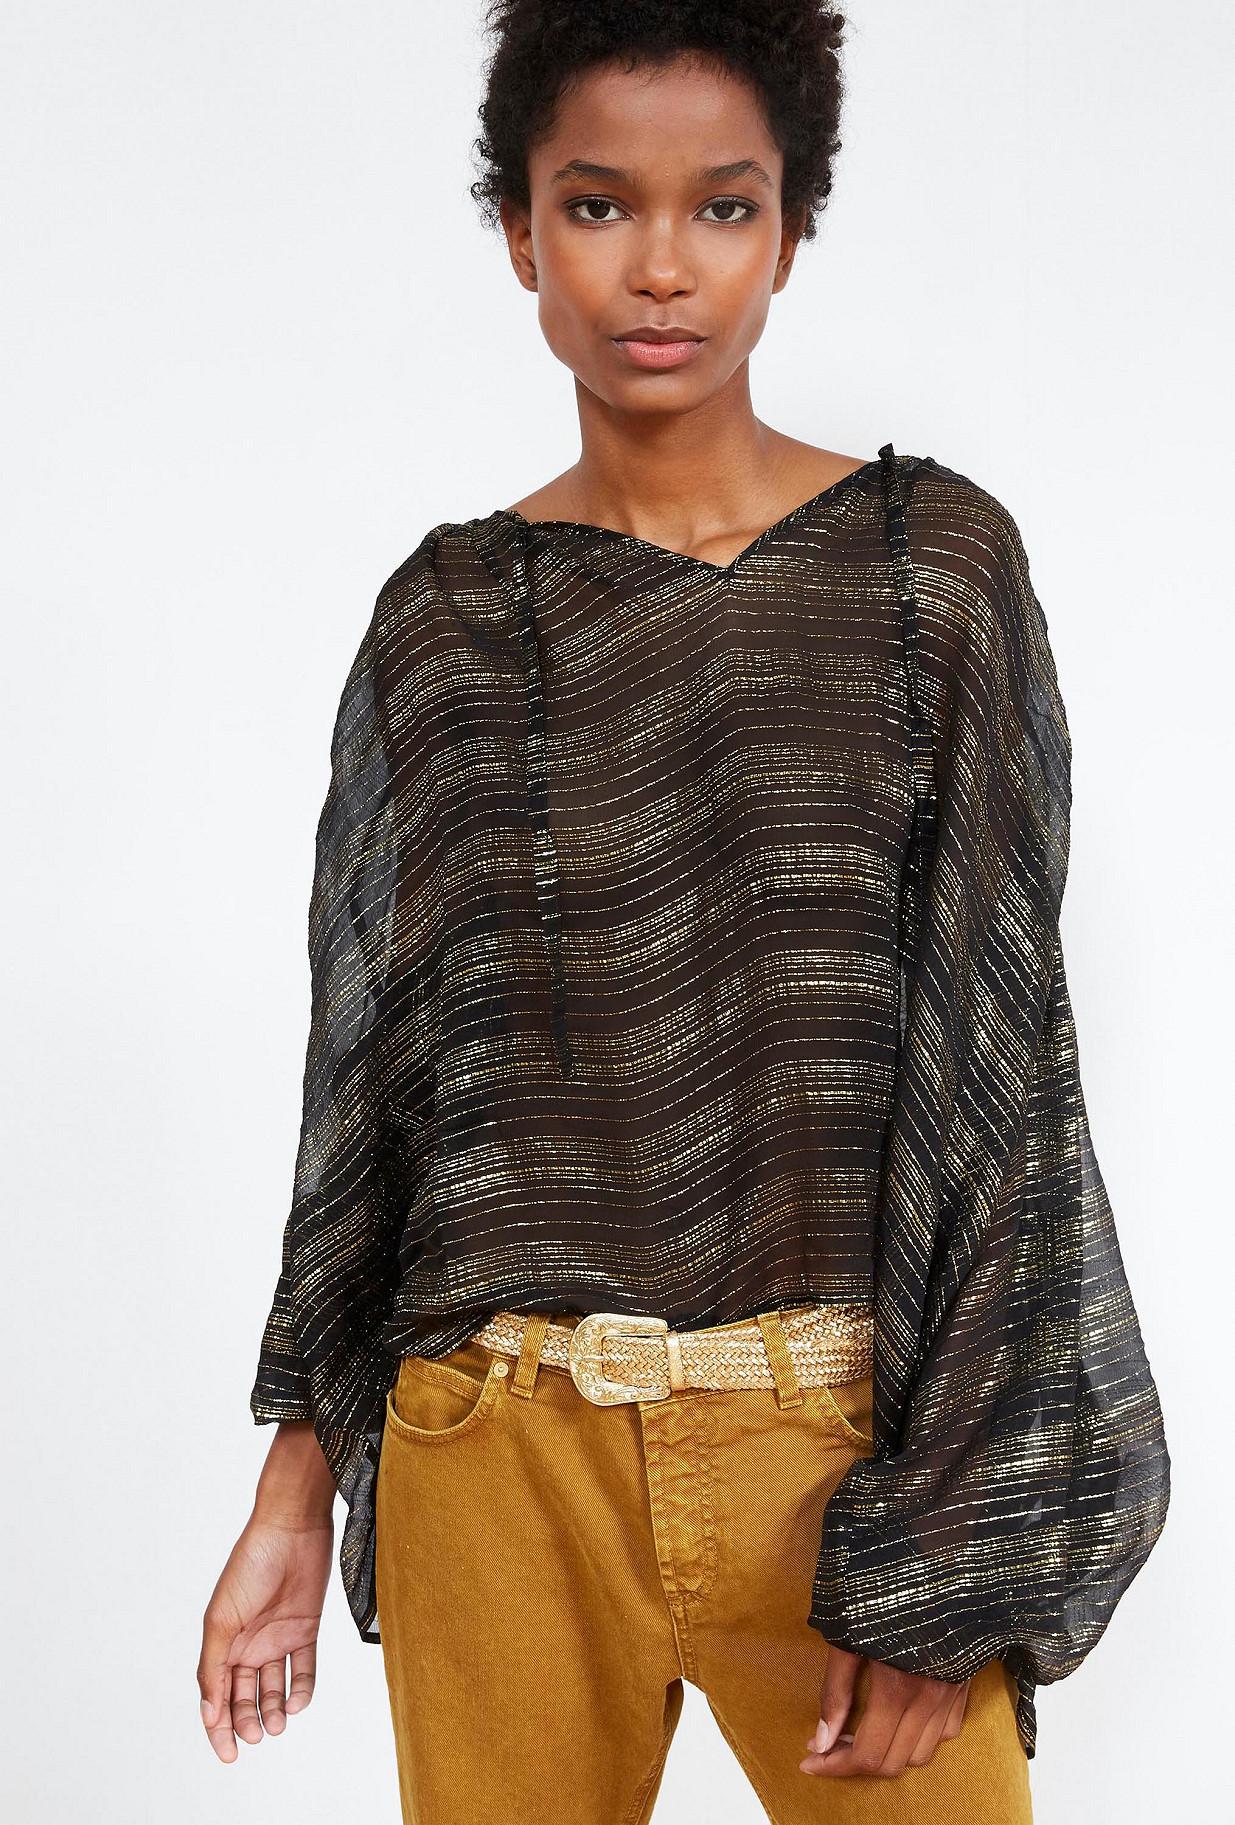 clothes store ACCESSORIES  Atoum french designer fashion Paris